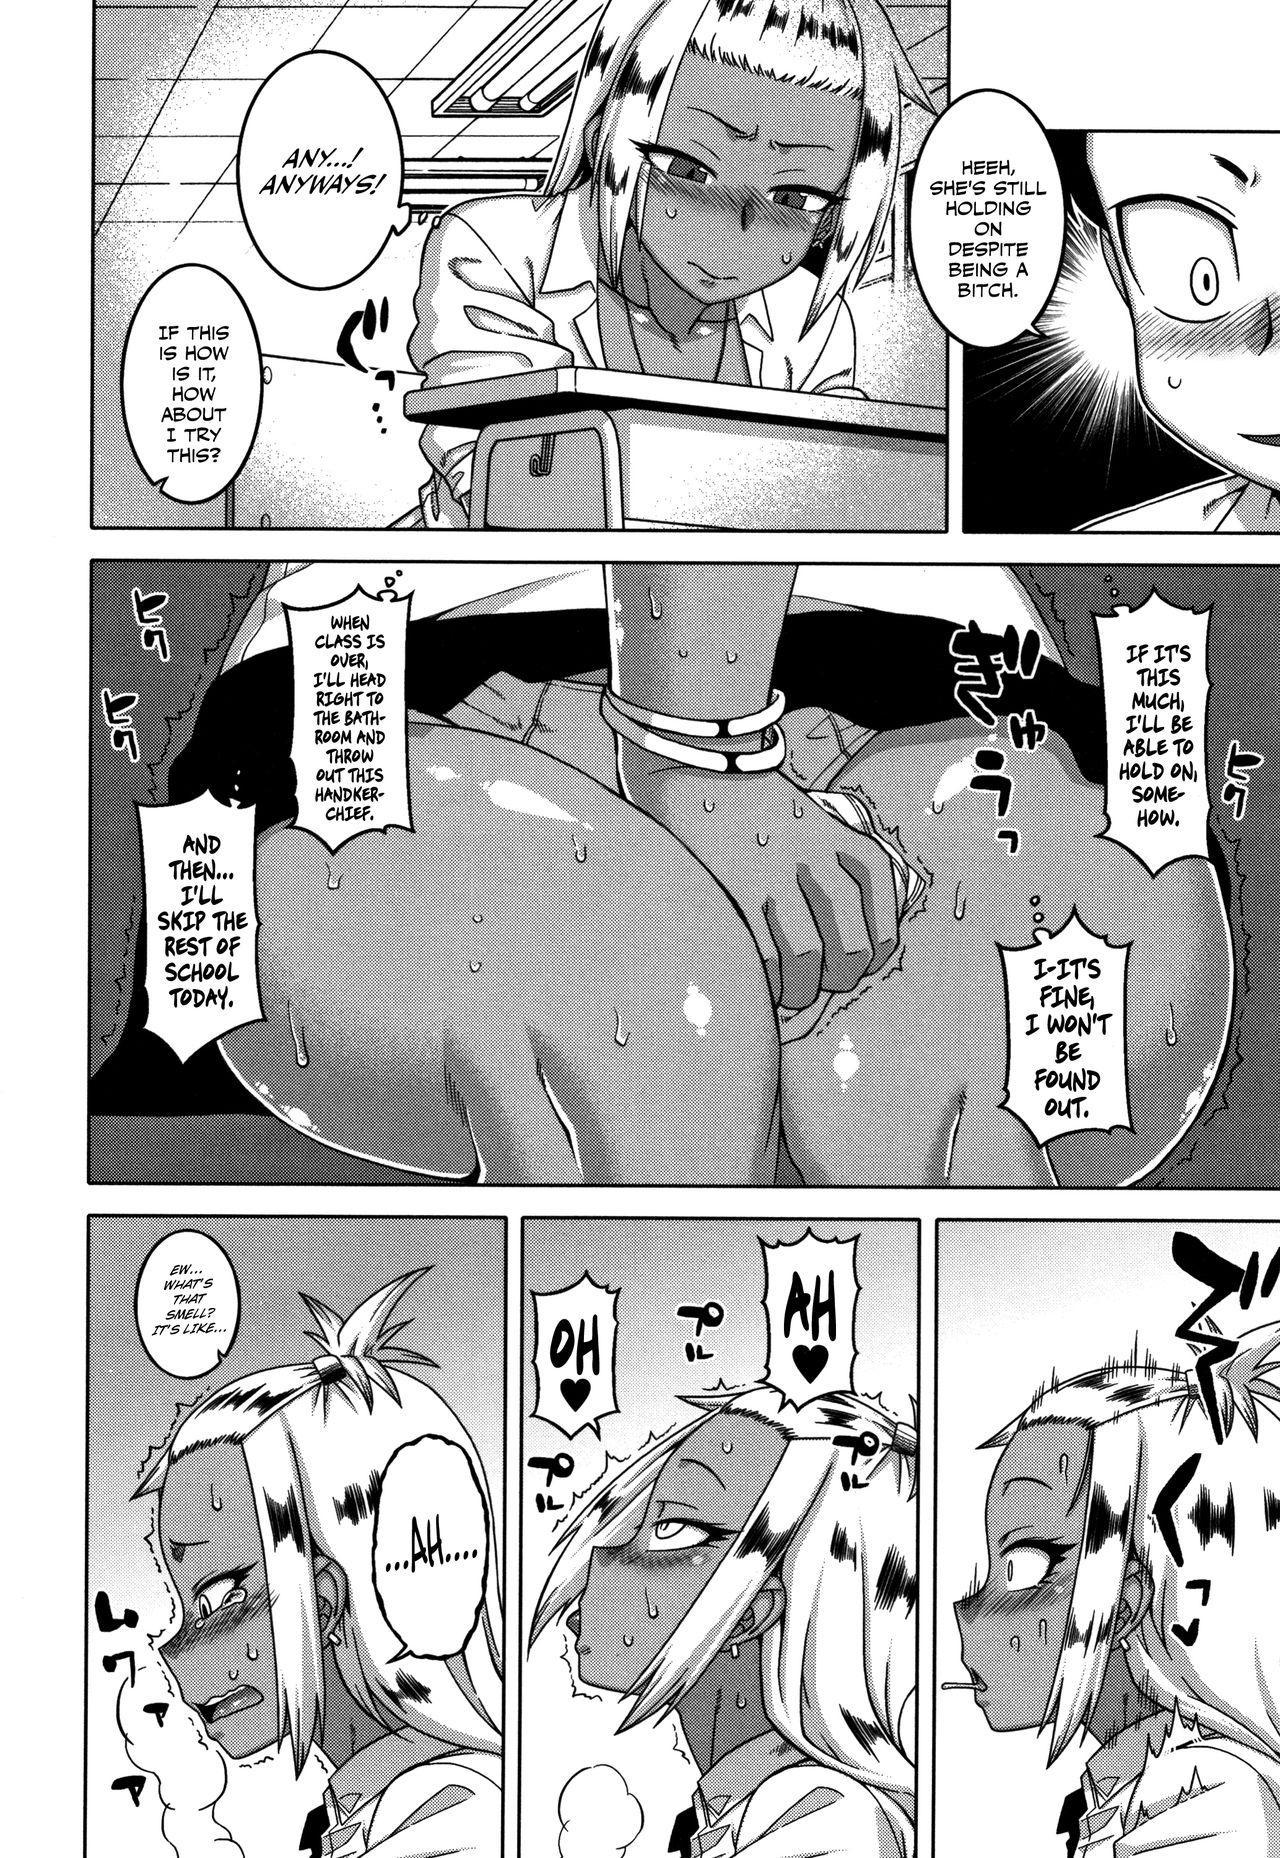 [Takatsu] Kami-sama no Iu Toori   As God Says Ch. 1-2 [English] [Secluded] 40